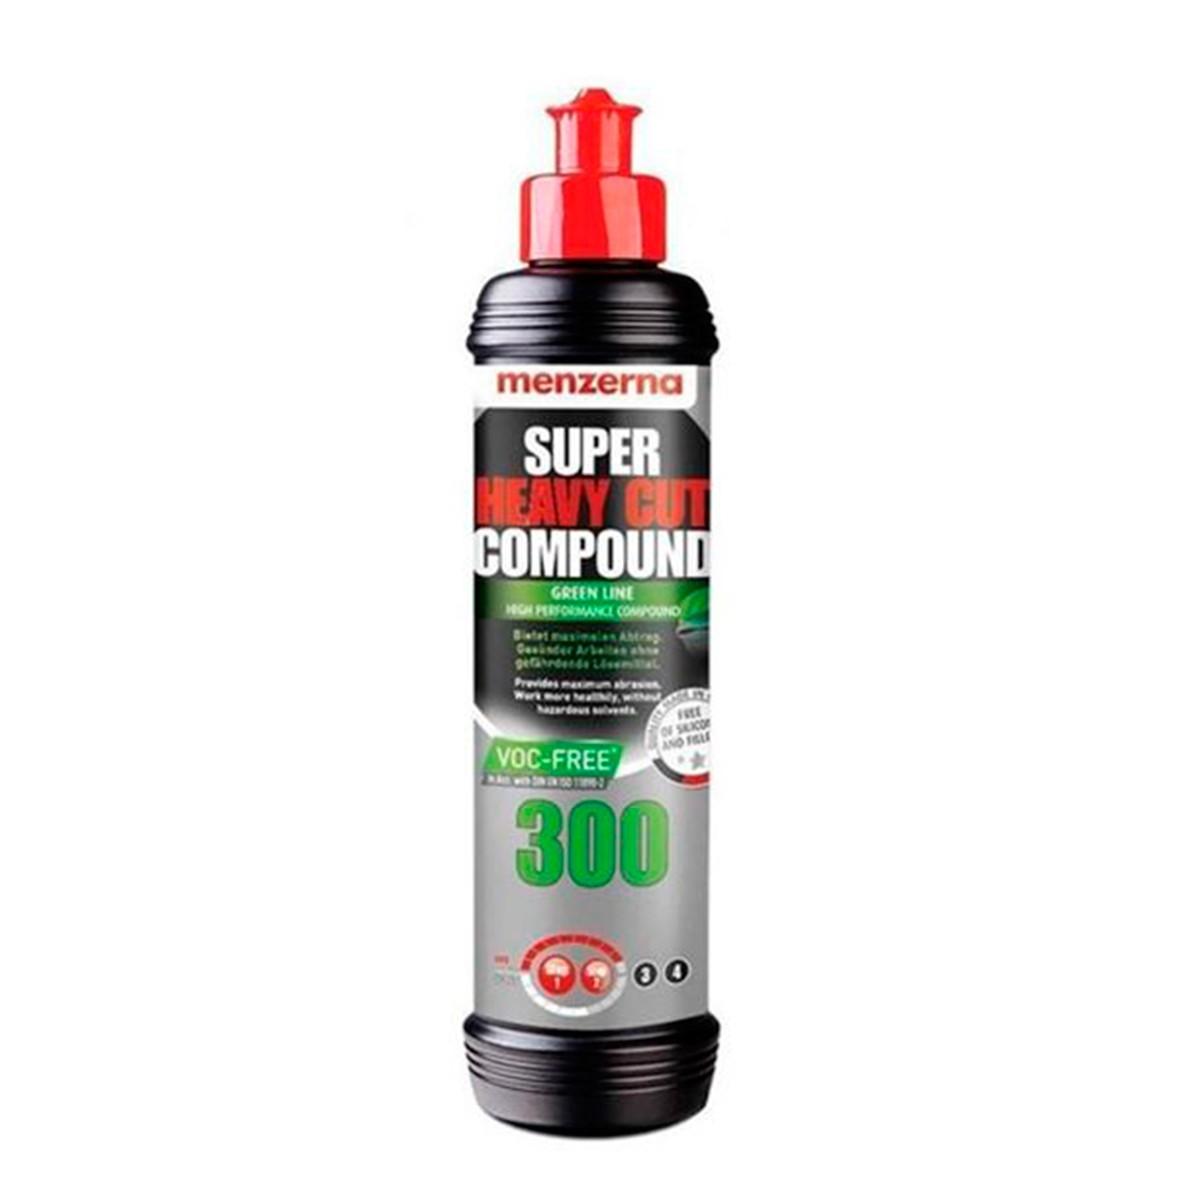 Super Heavy Cut Compound 300 - Green Line 250ml - Menzerna